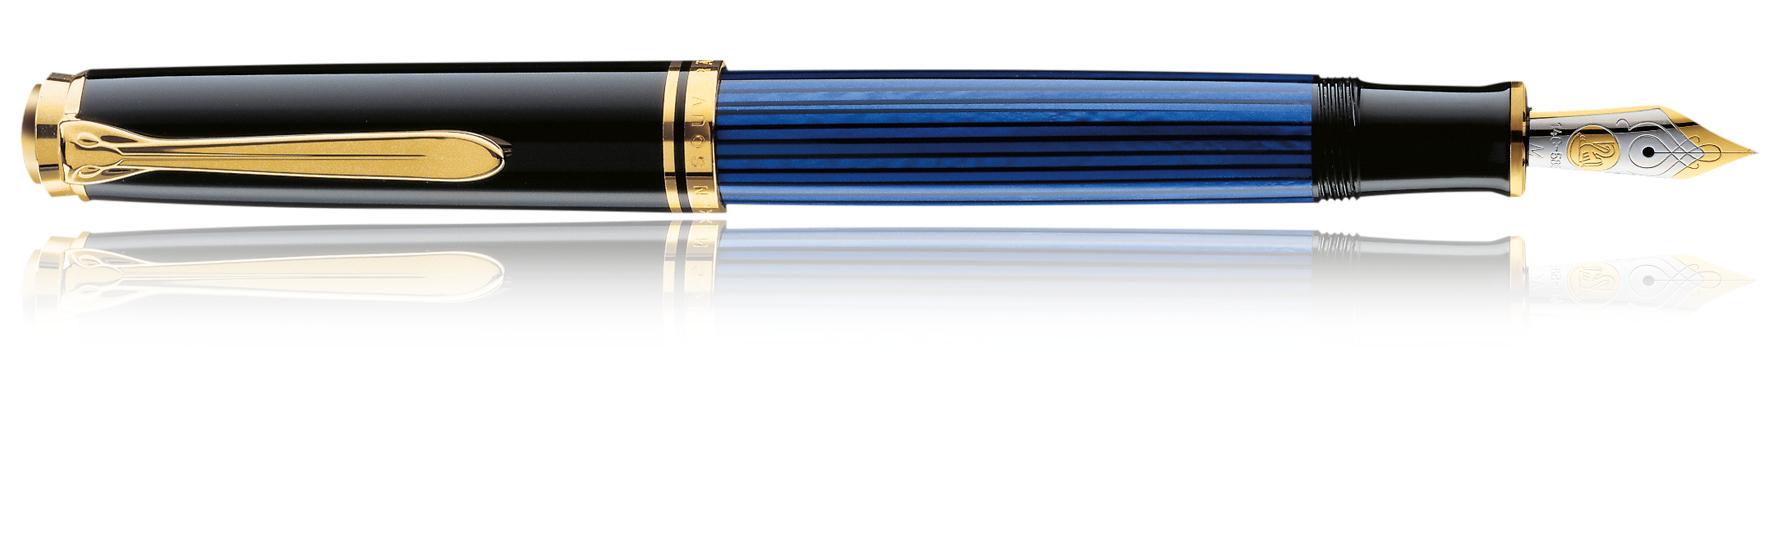 Pelikan Souverän M 400 - Schwarz - Blau - Gold - Gold - 1 Stück(e)